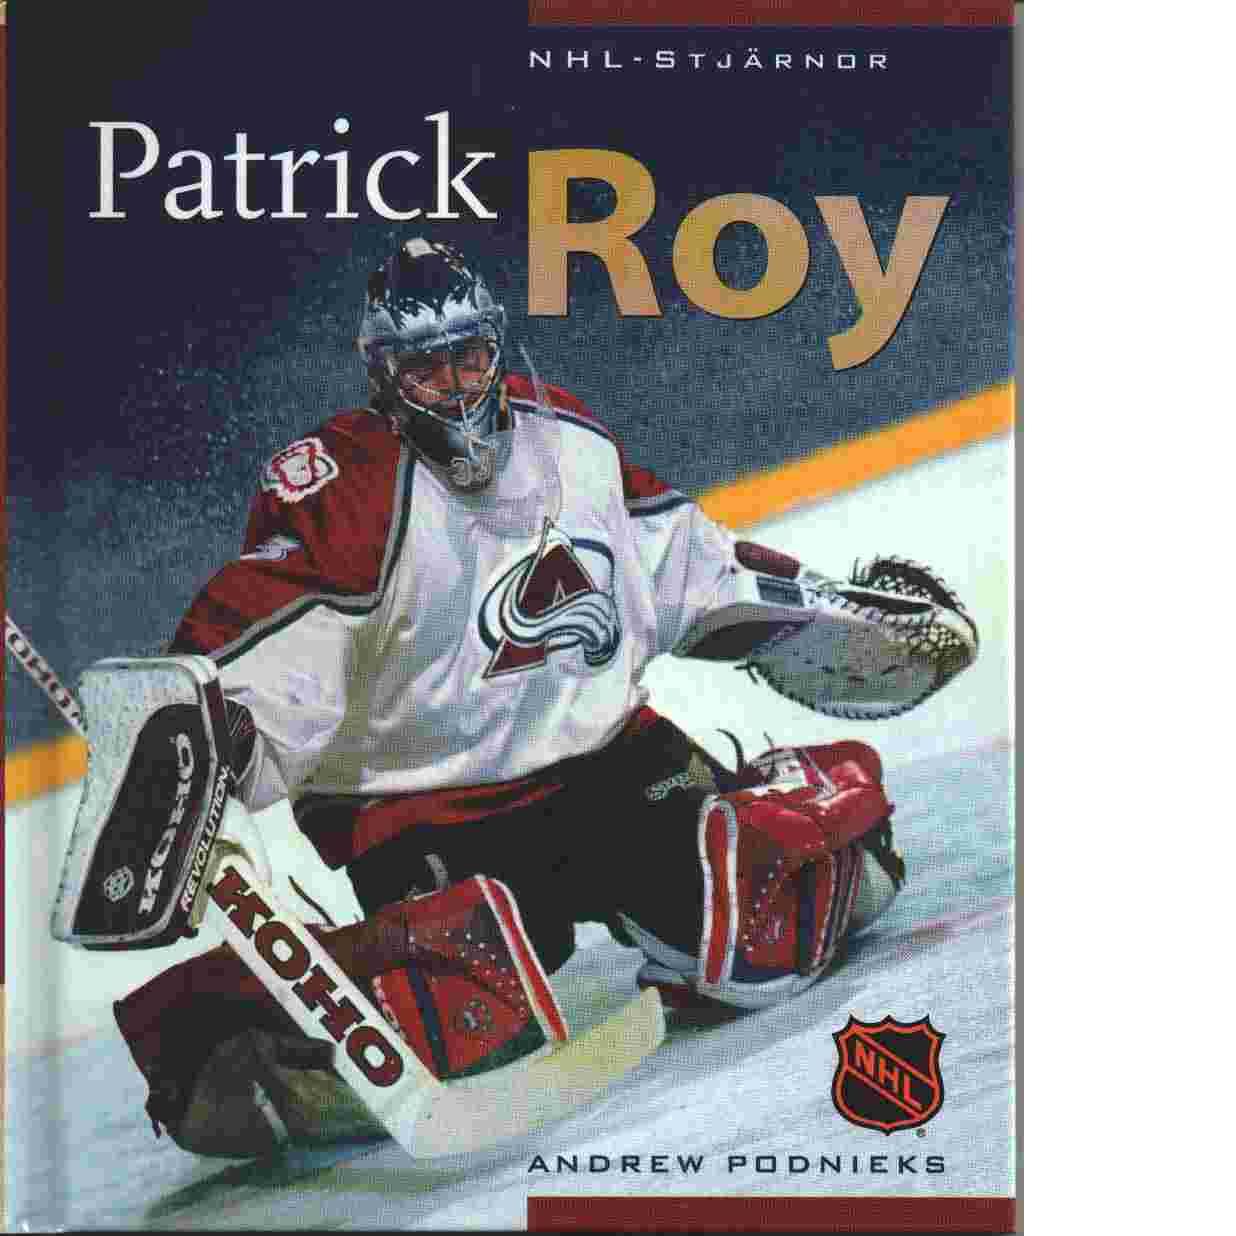 Patrick Roy - Podnieks, Andrew